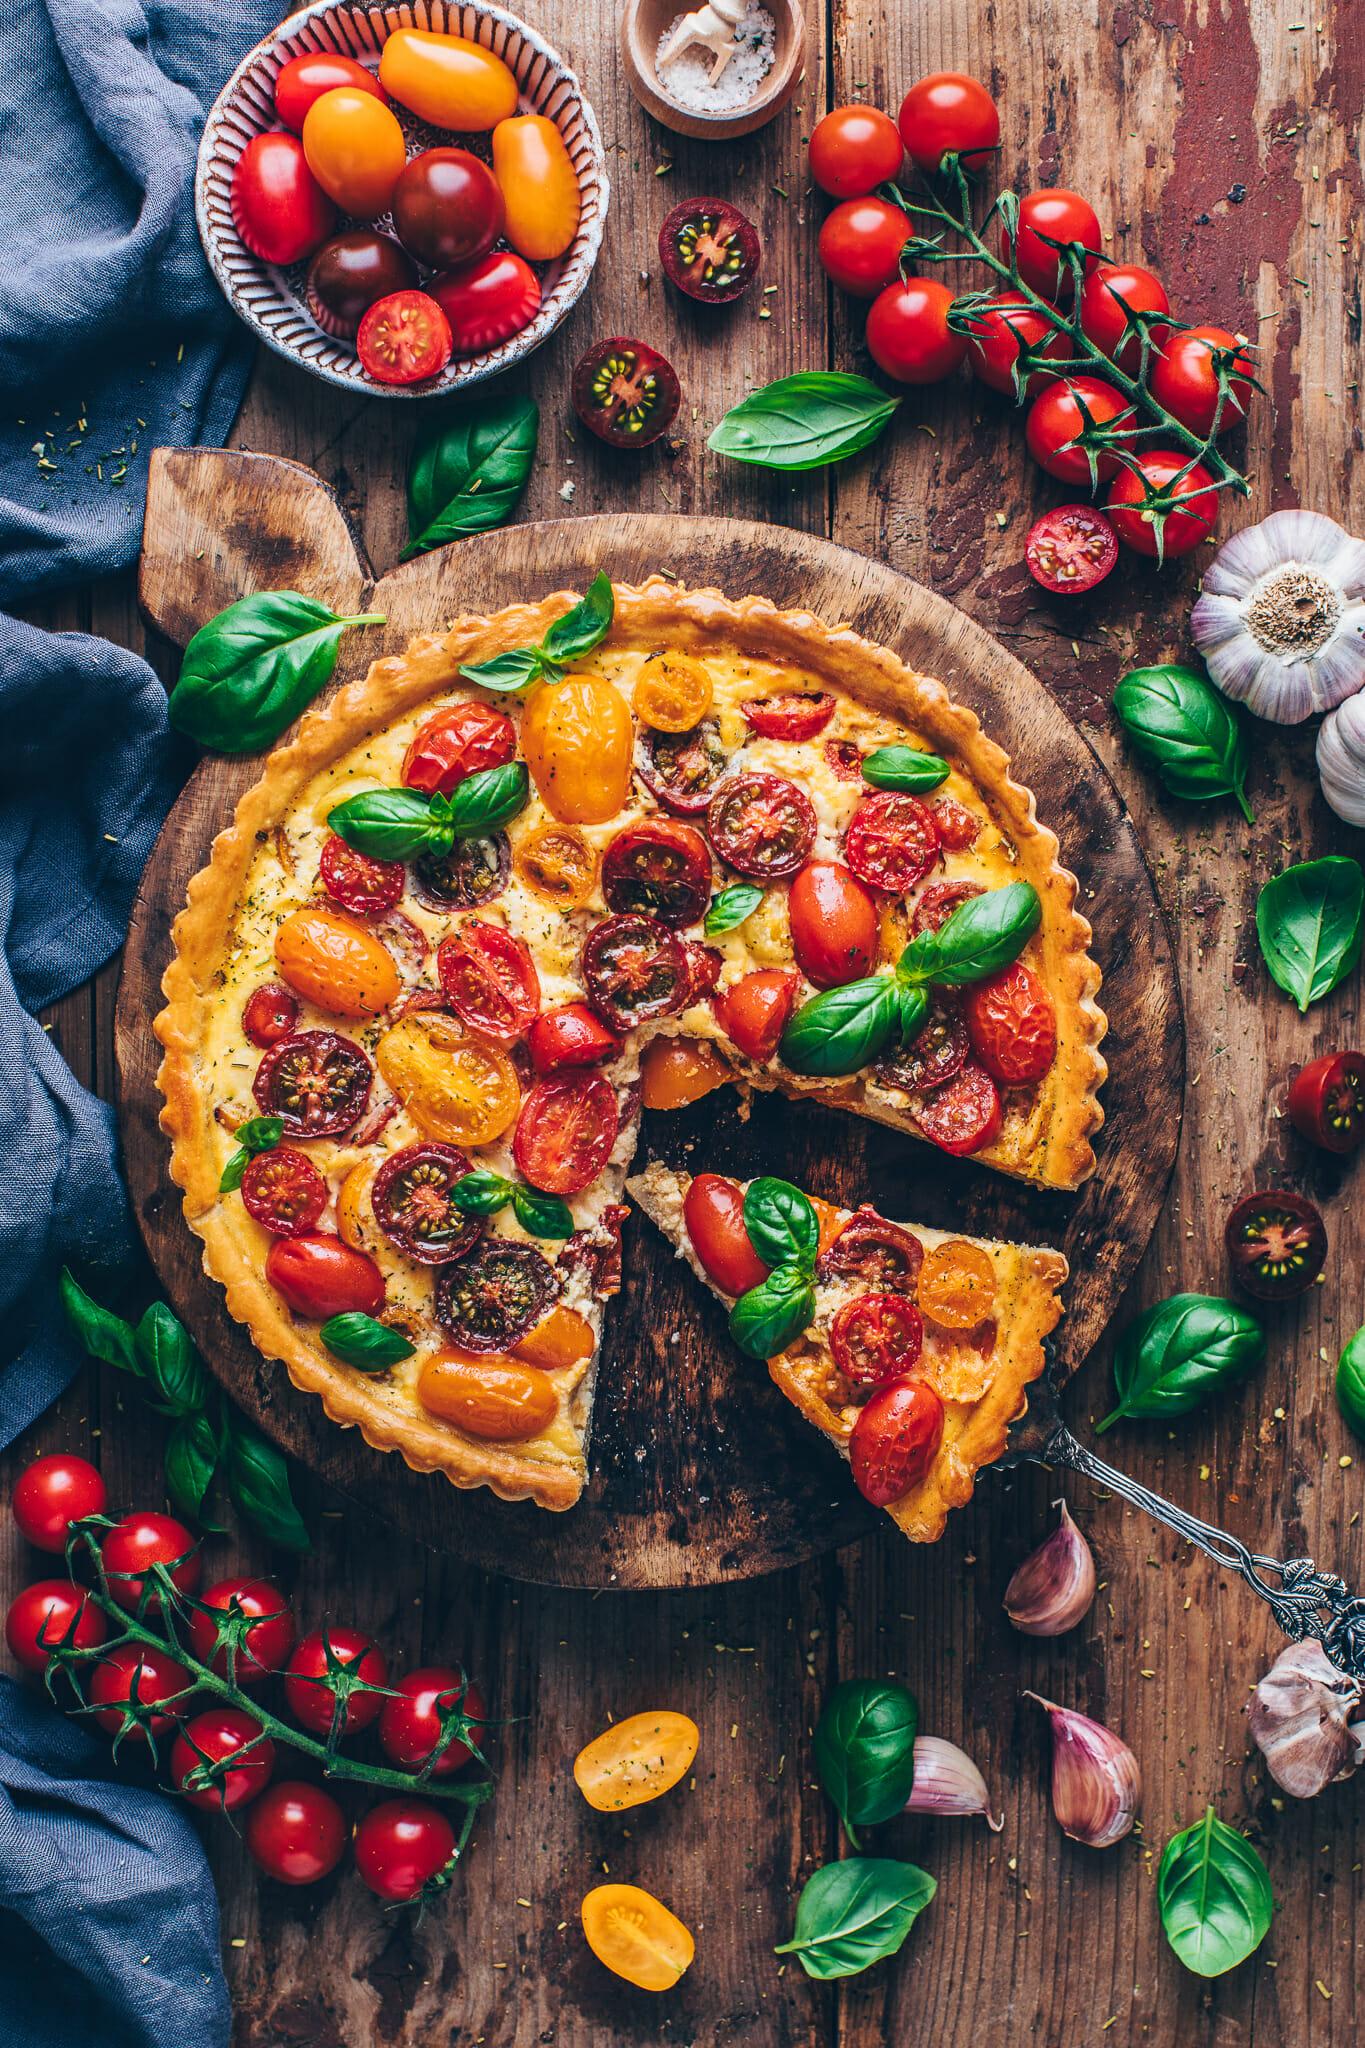 Bunte Tomaten Quiche Tarte mit Basilikum | Food Photography